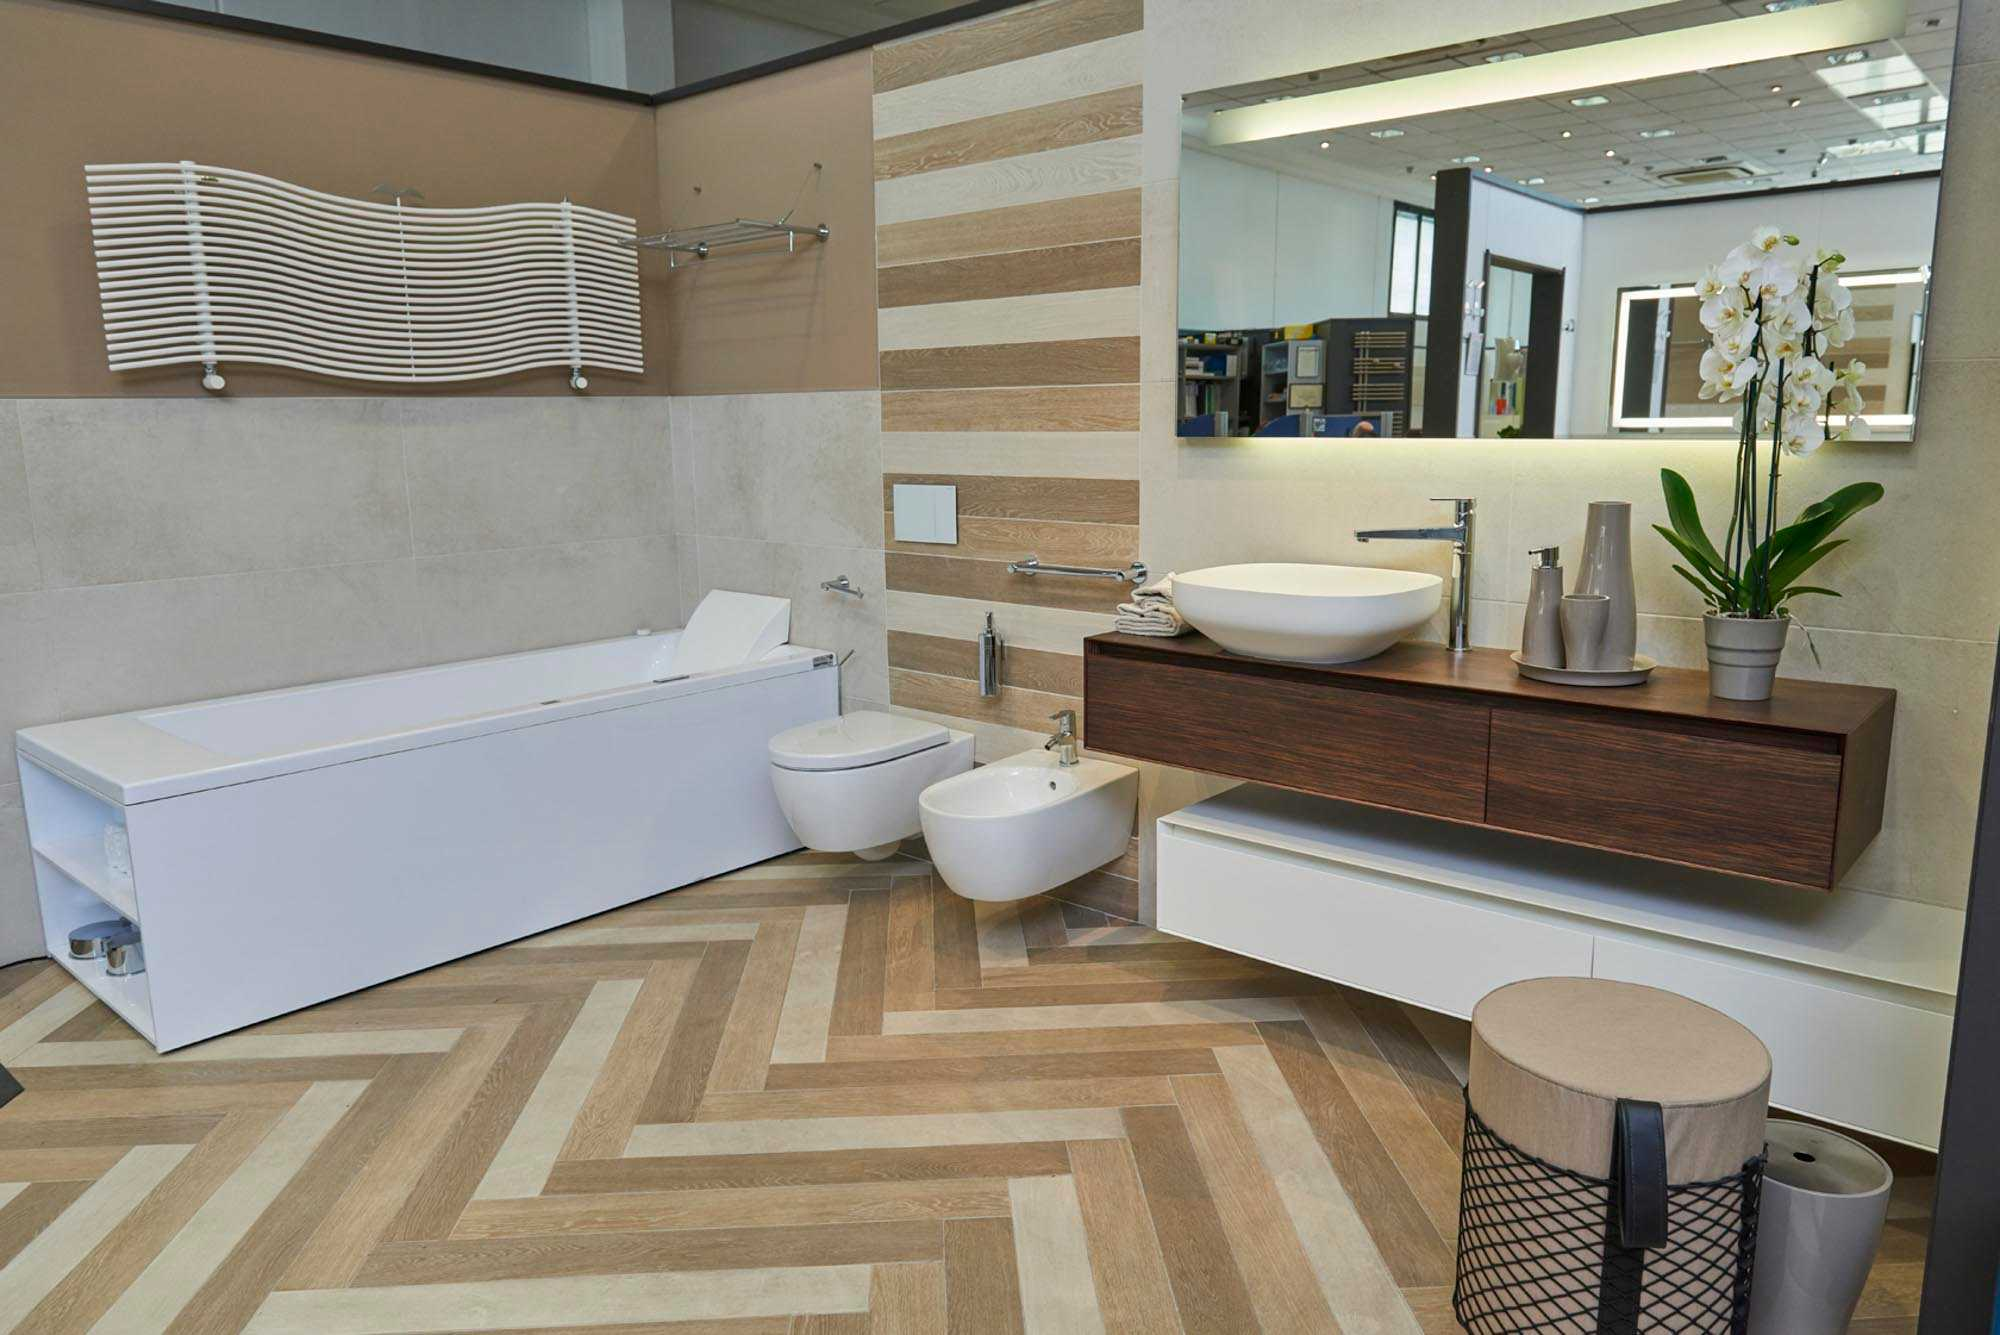 Showroom SVAI_Casaleone_arredobagno moderno bianco e legno